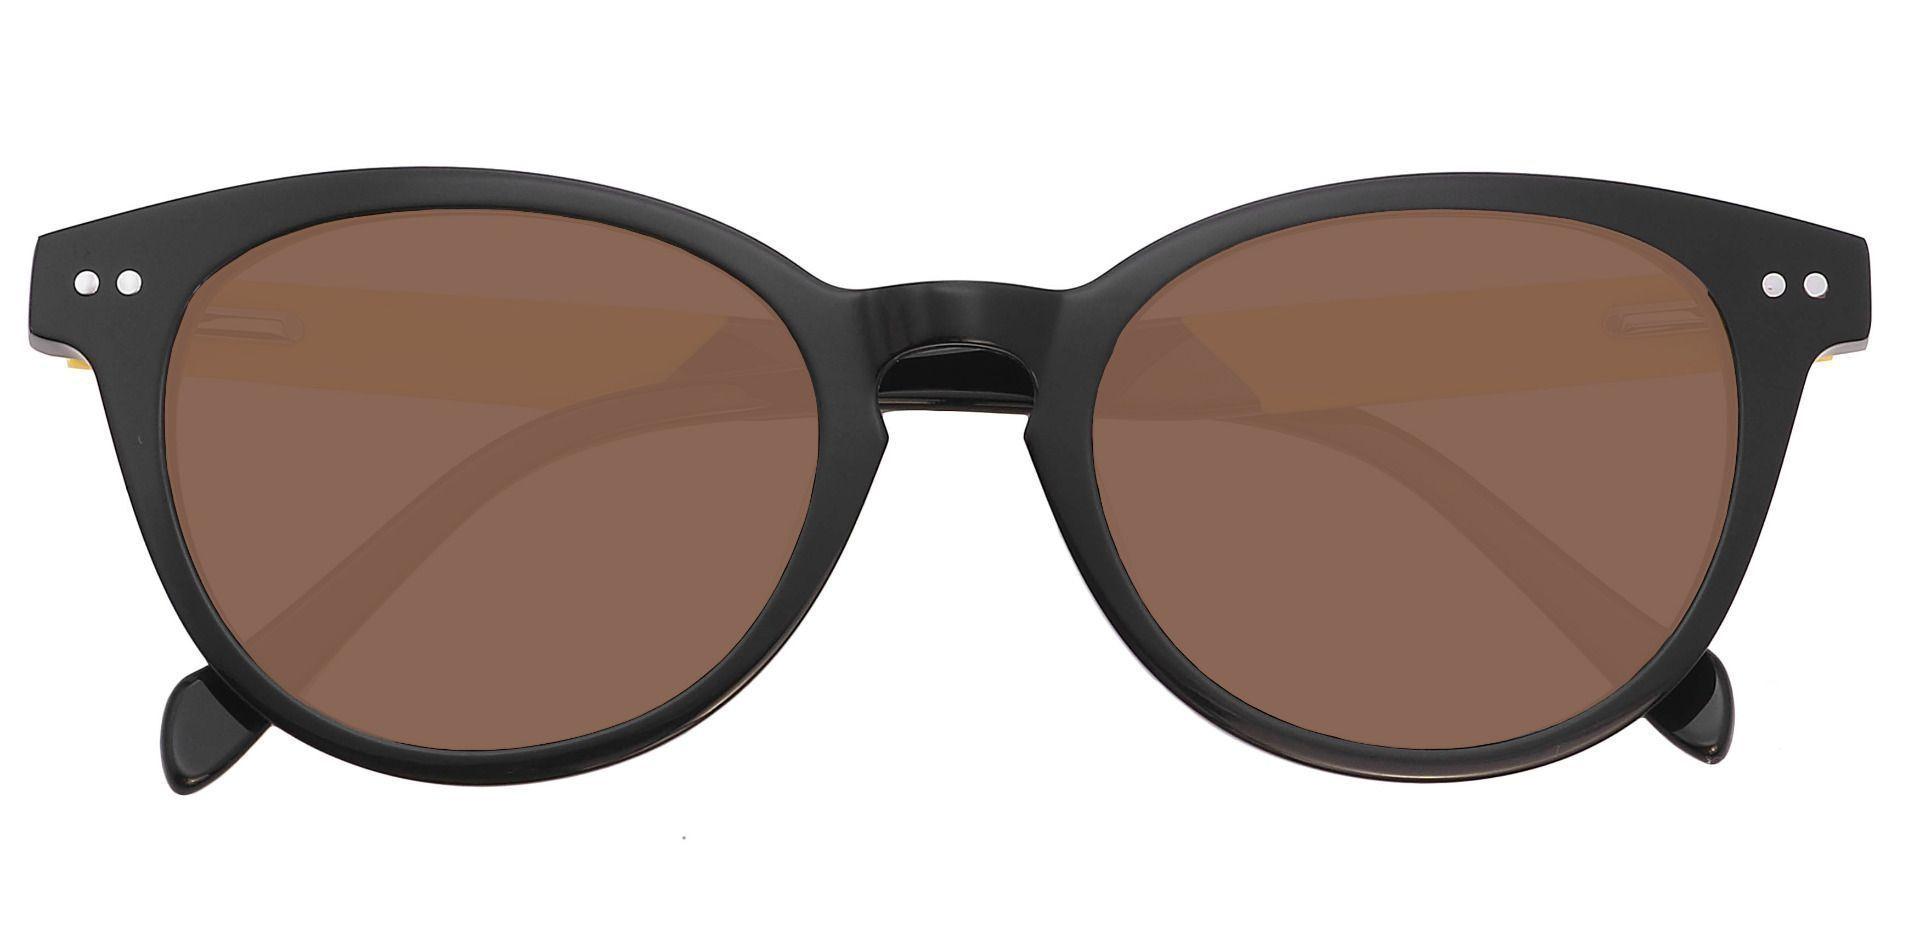 Forbes Oval Progressive Sunglasses - Black Frame With Brown Lenses